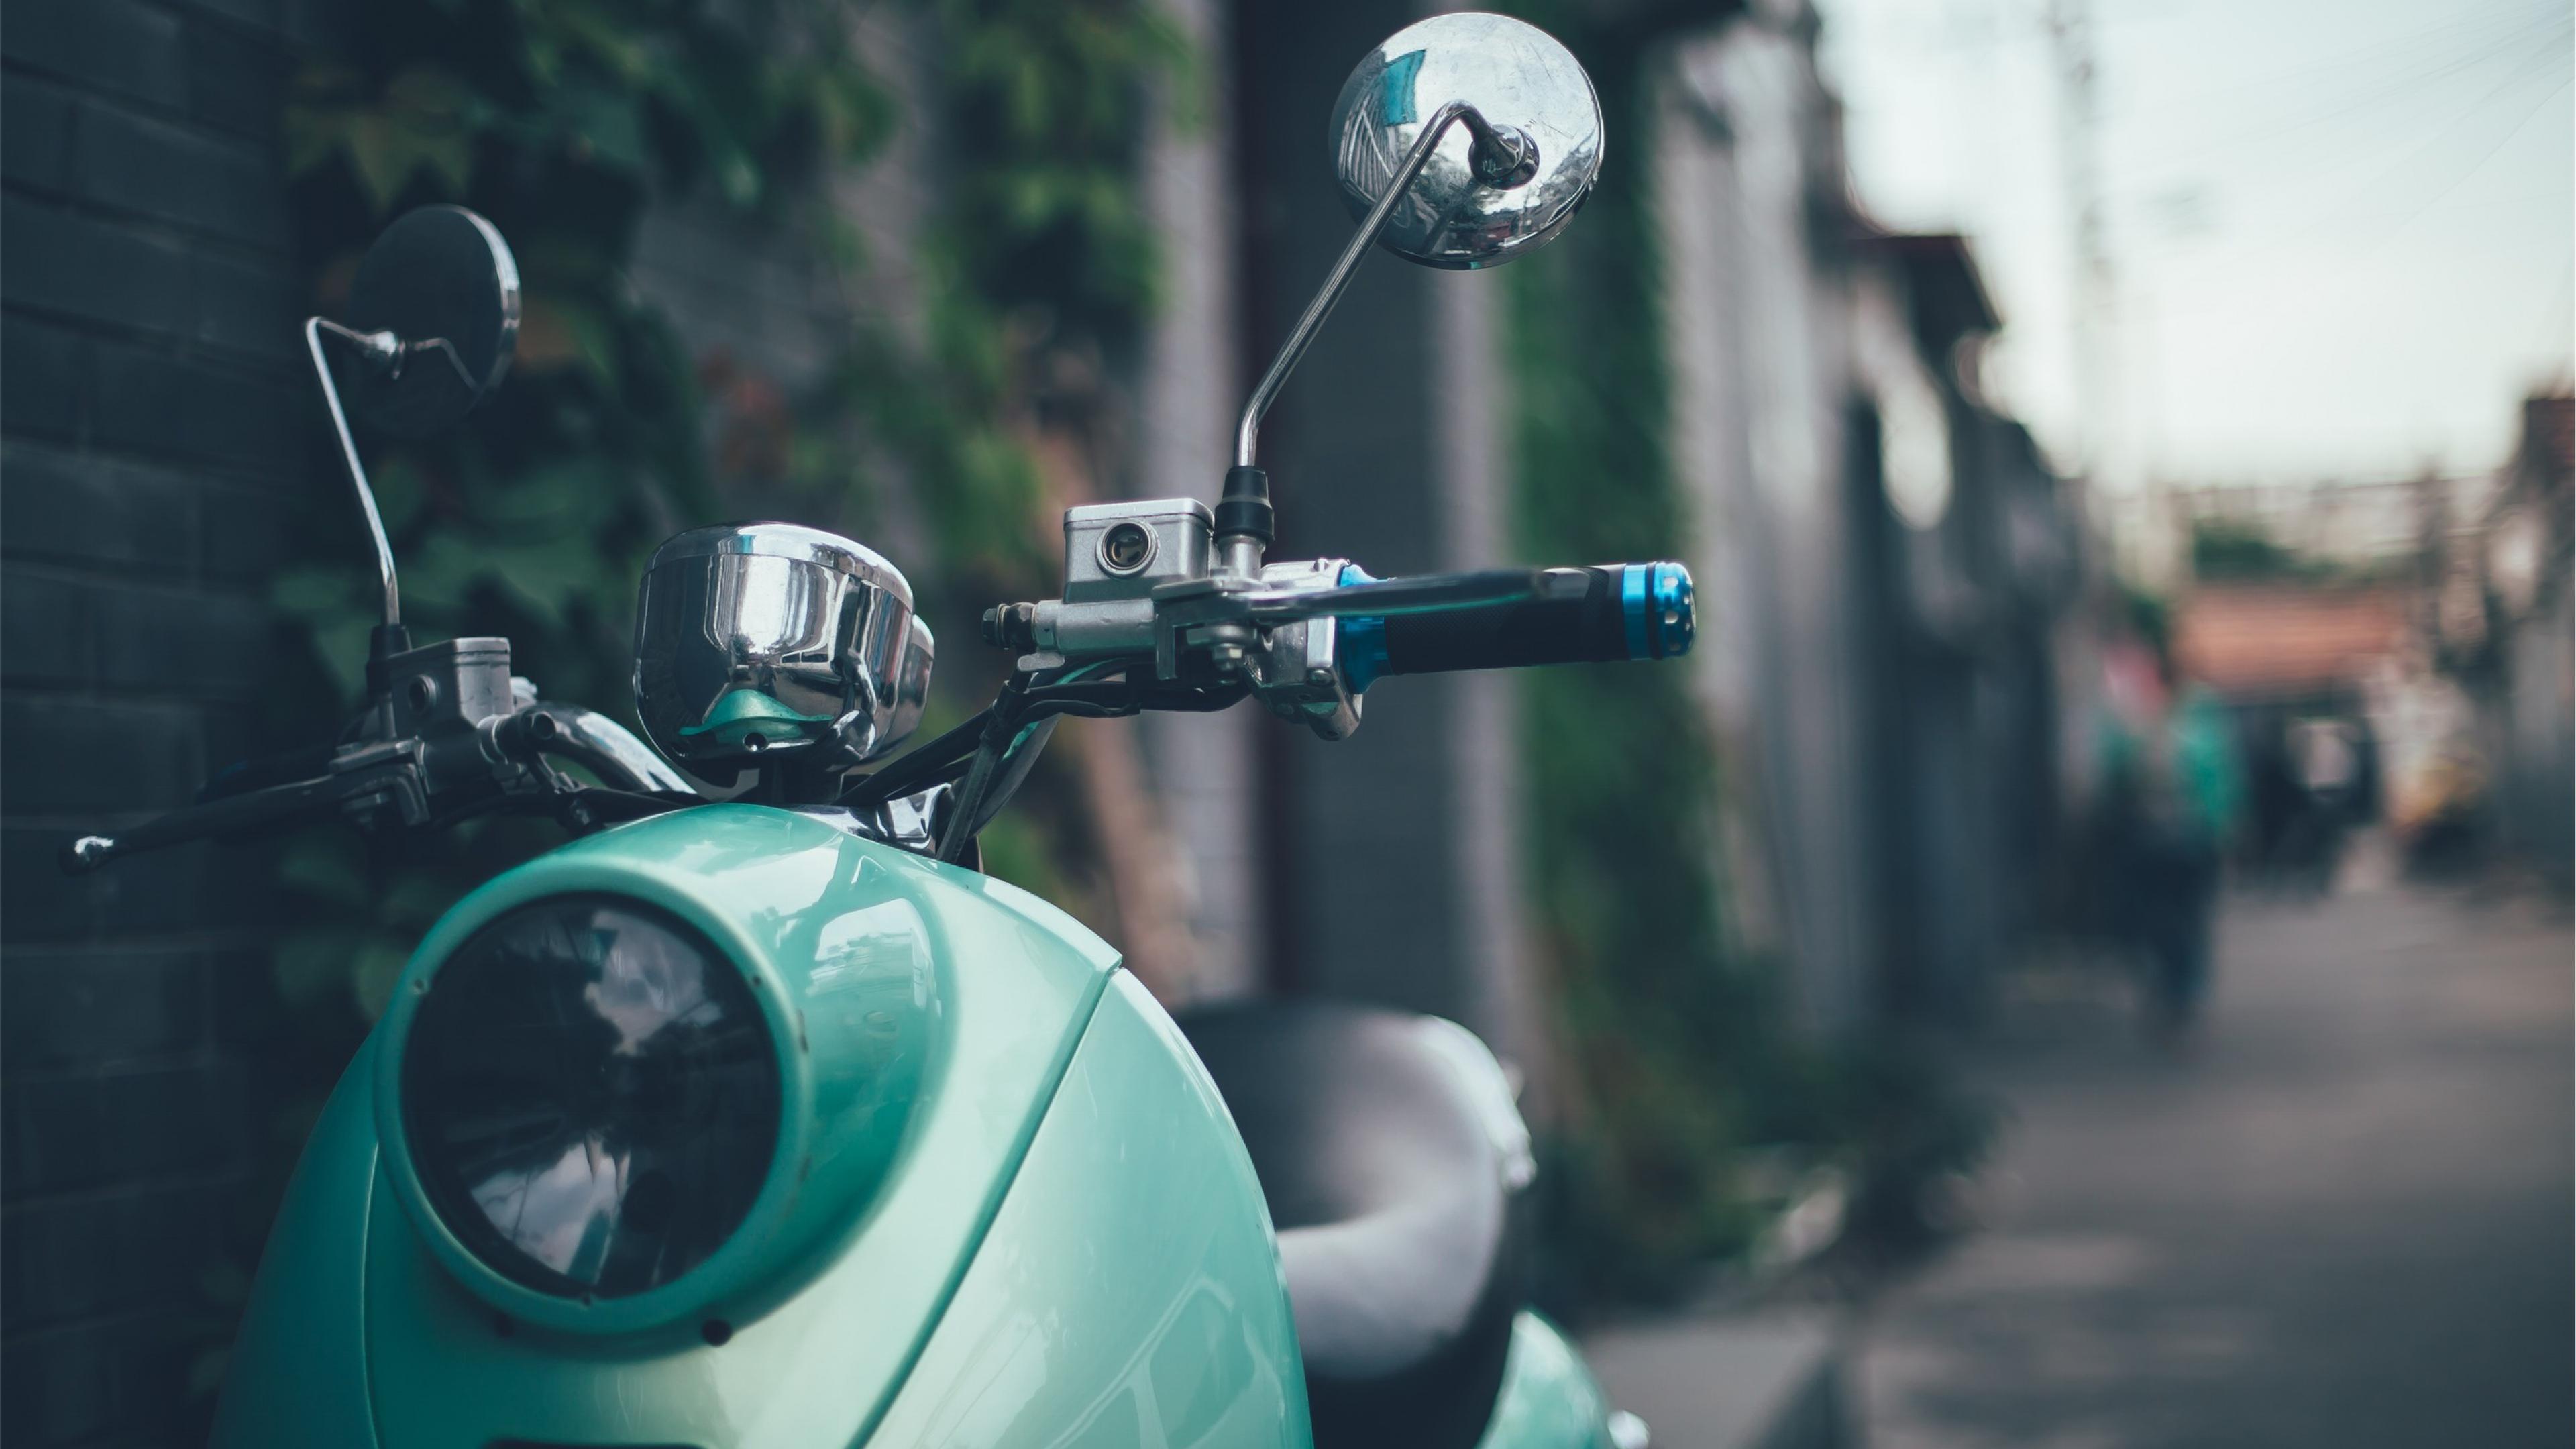 vespa scooter vintage hd bikes 4k wallpapers images backgrounds